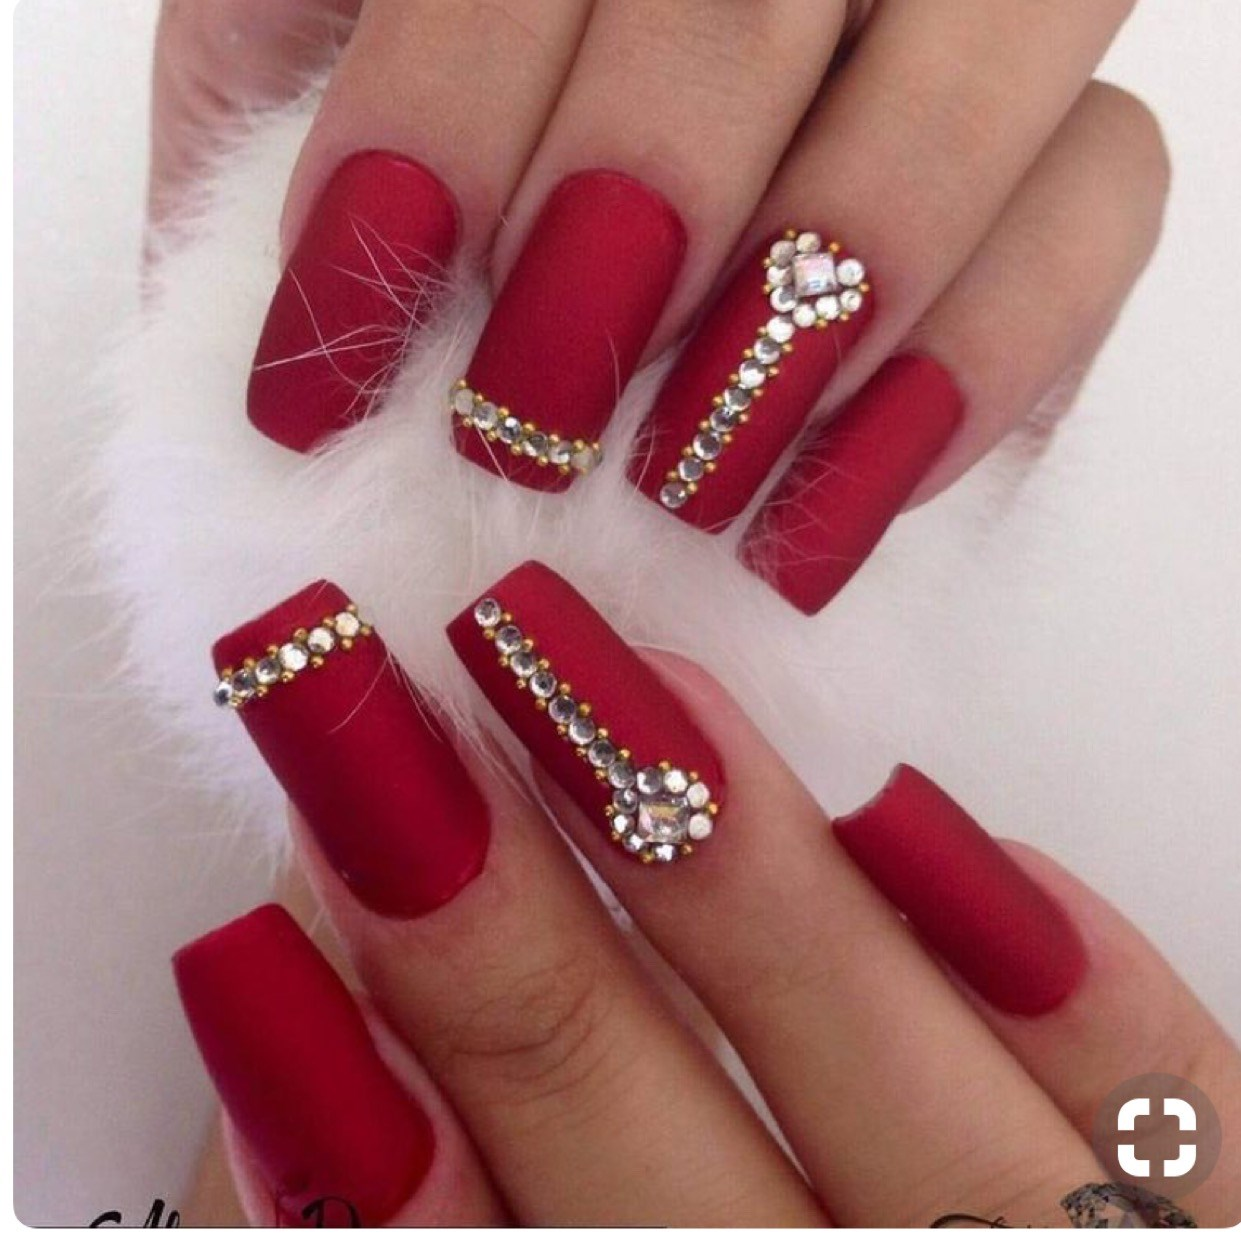 Дизайн на коротких ногтях 2018 фото